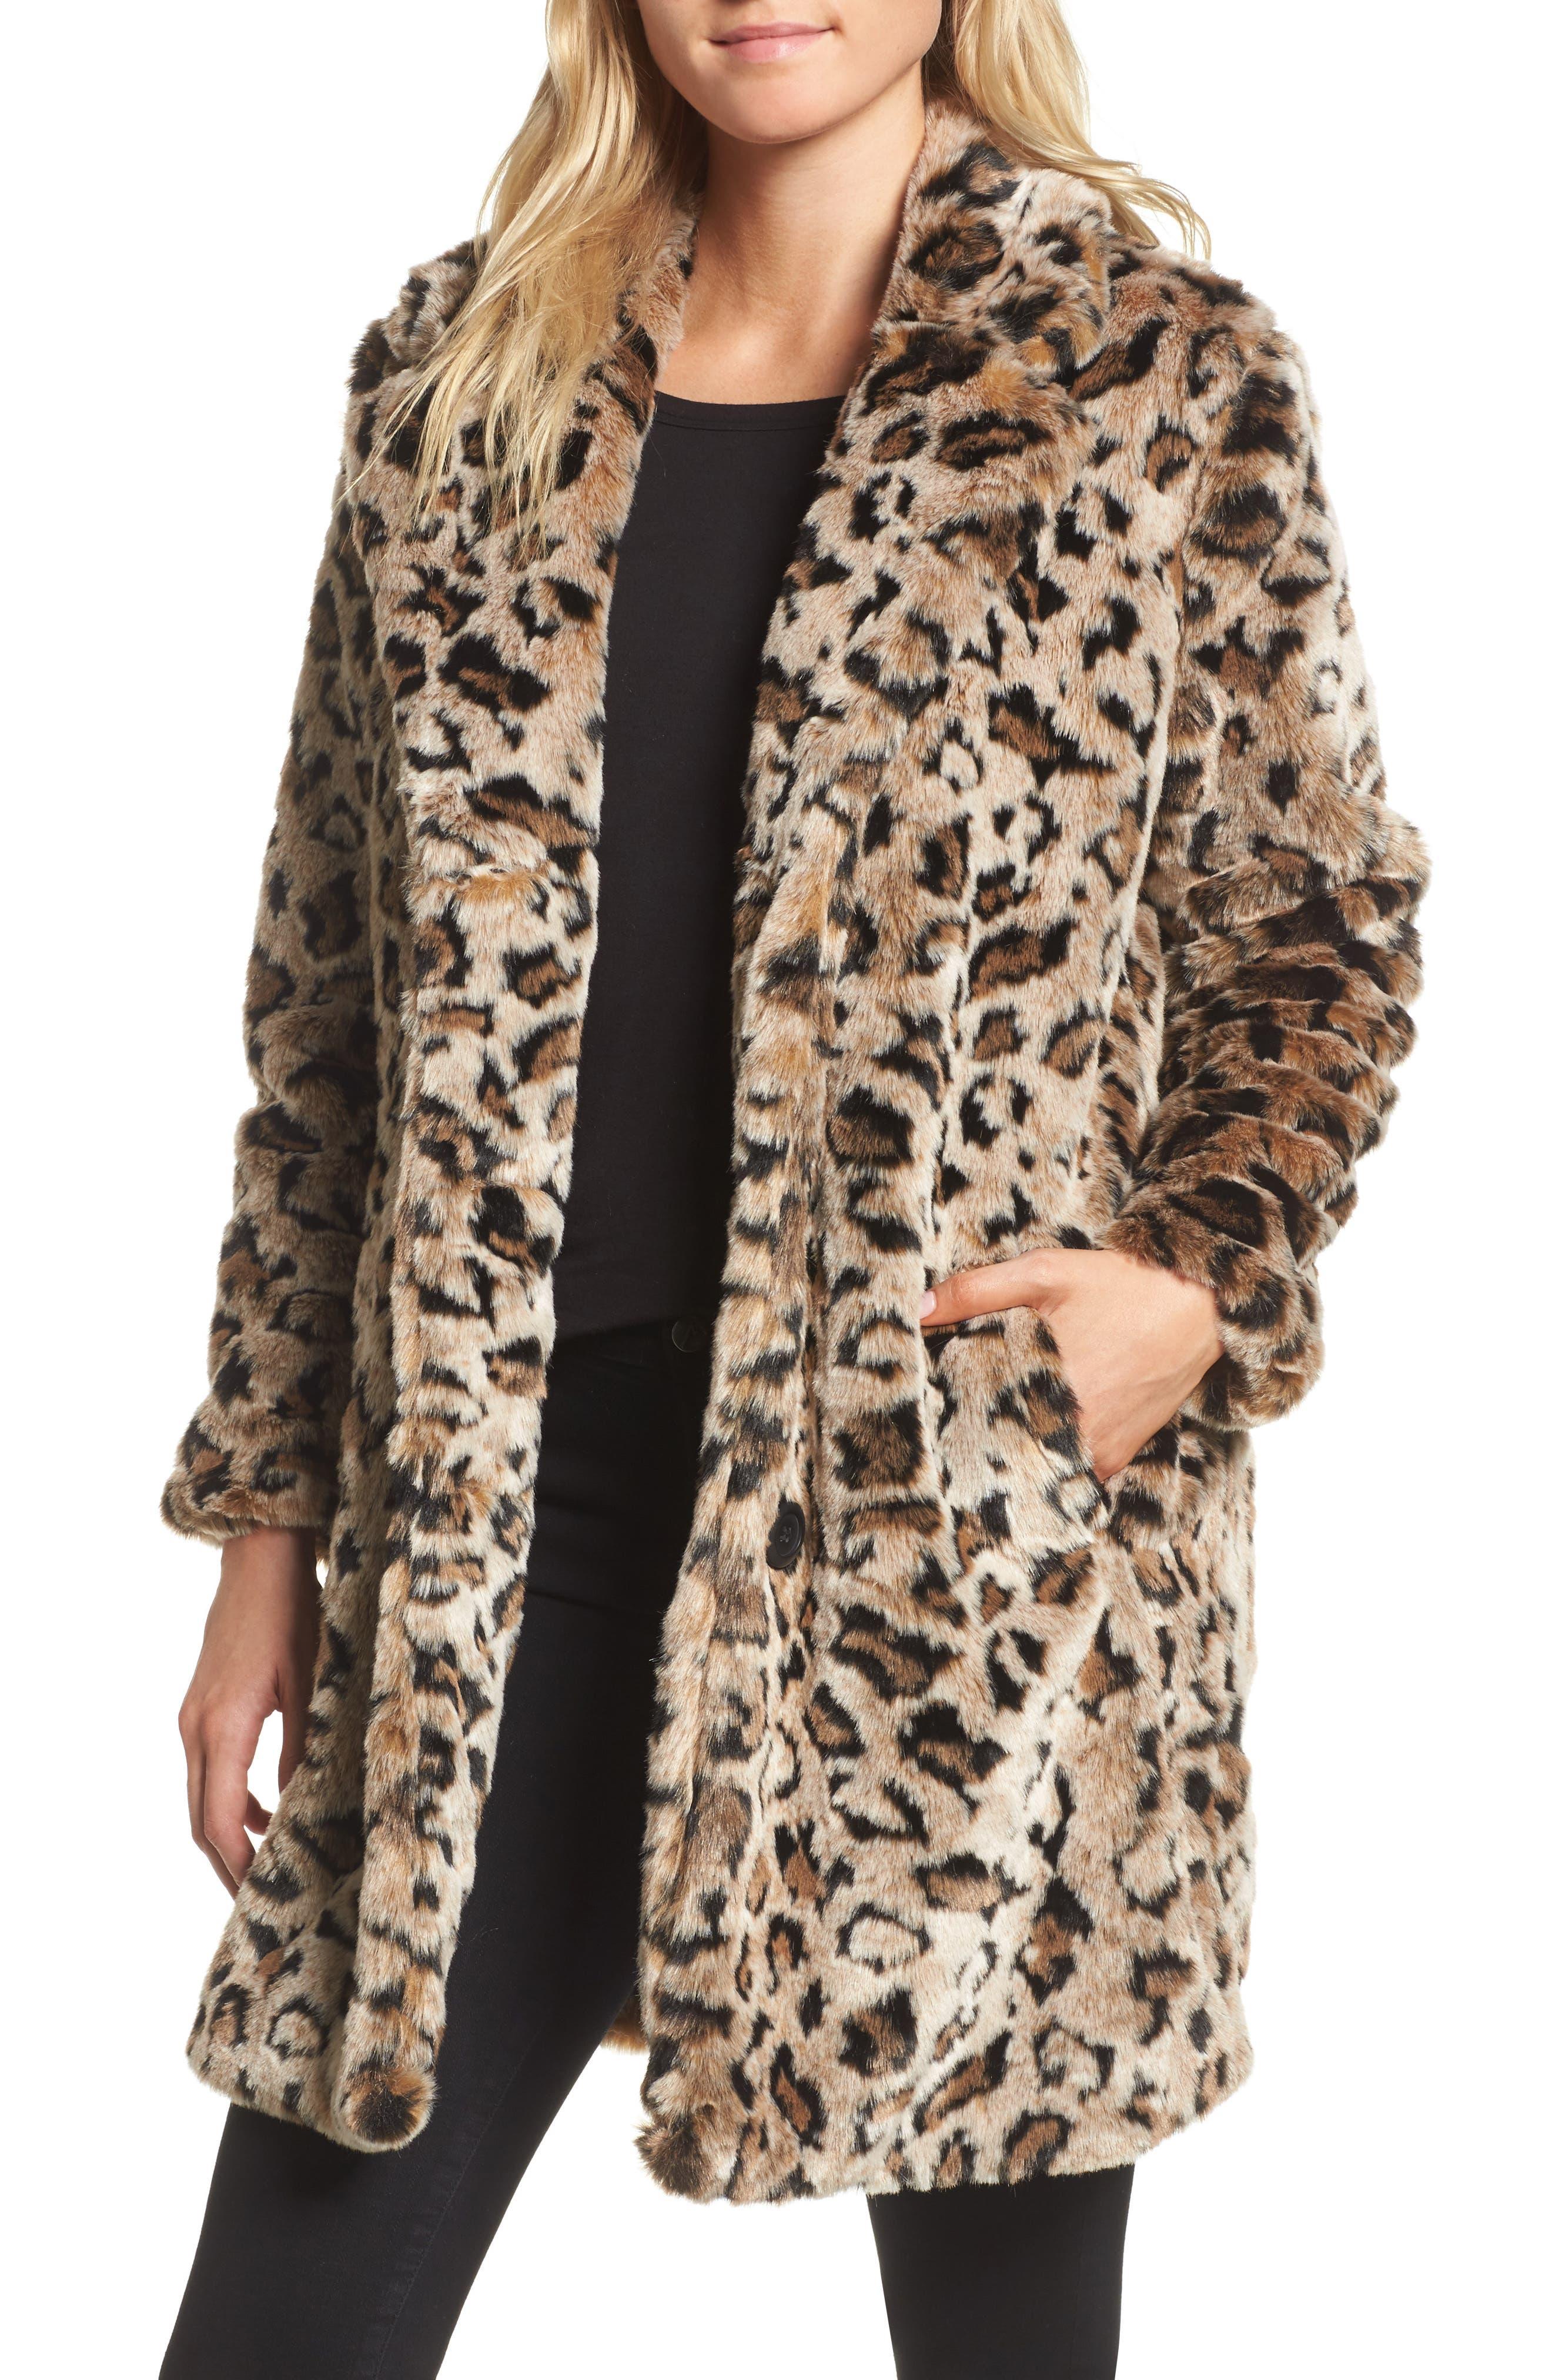 Abeni Faux Fur Coat,                             Main thumbnail 1, color,                             230